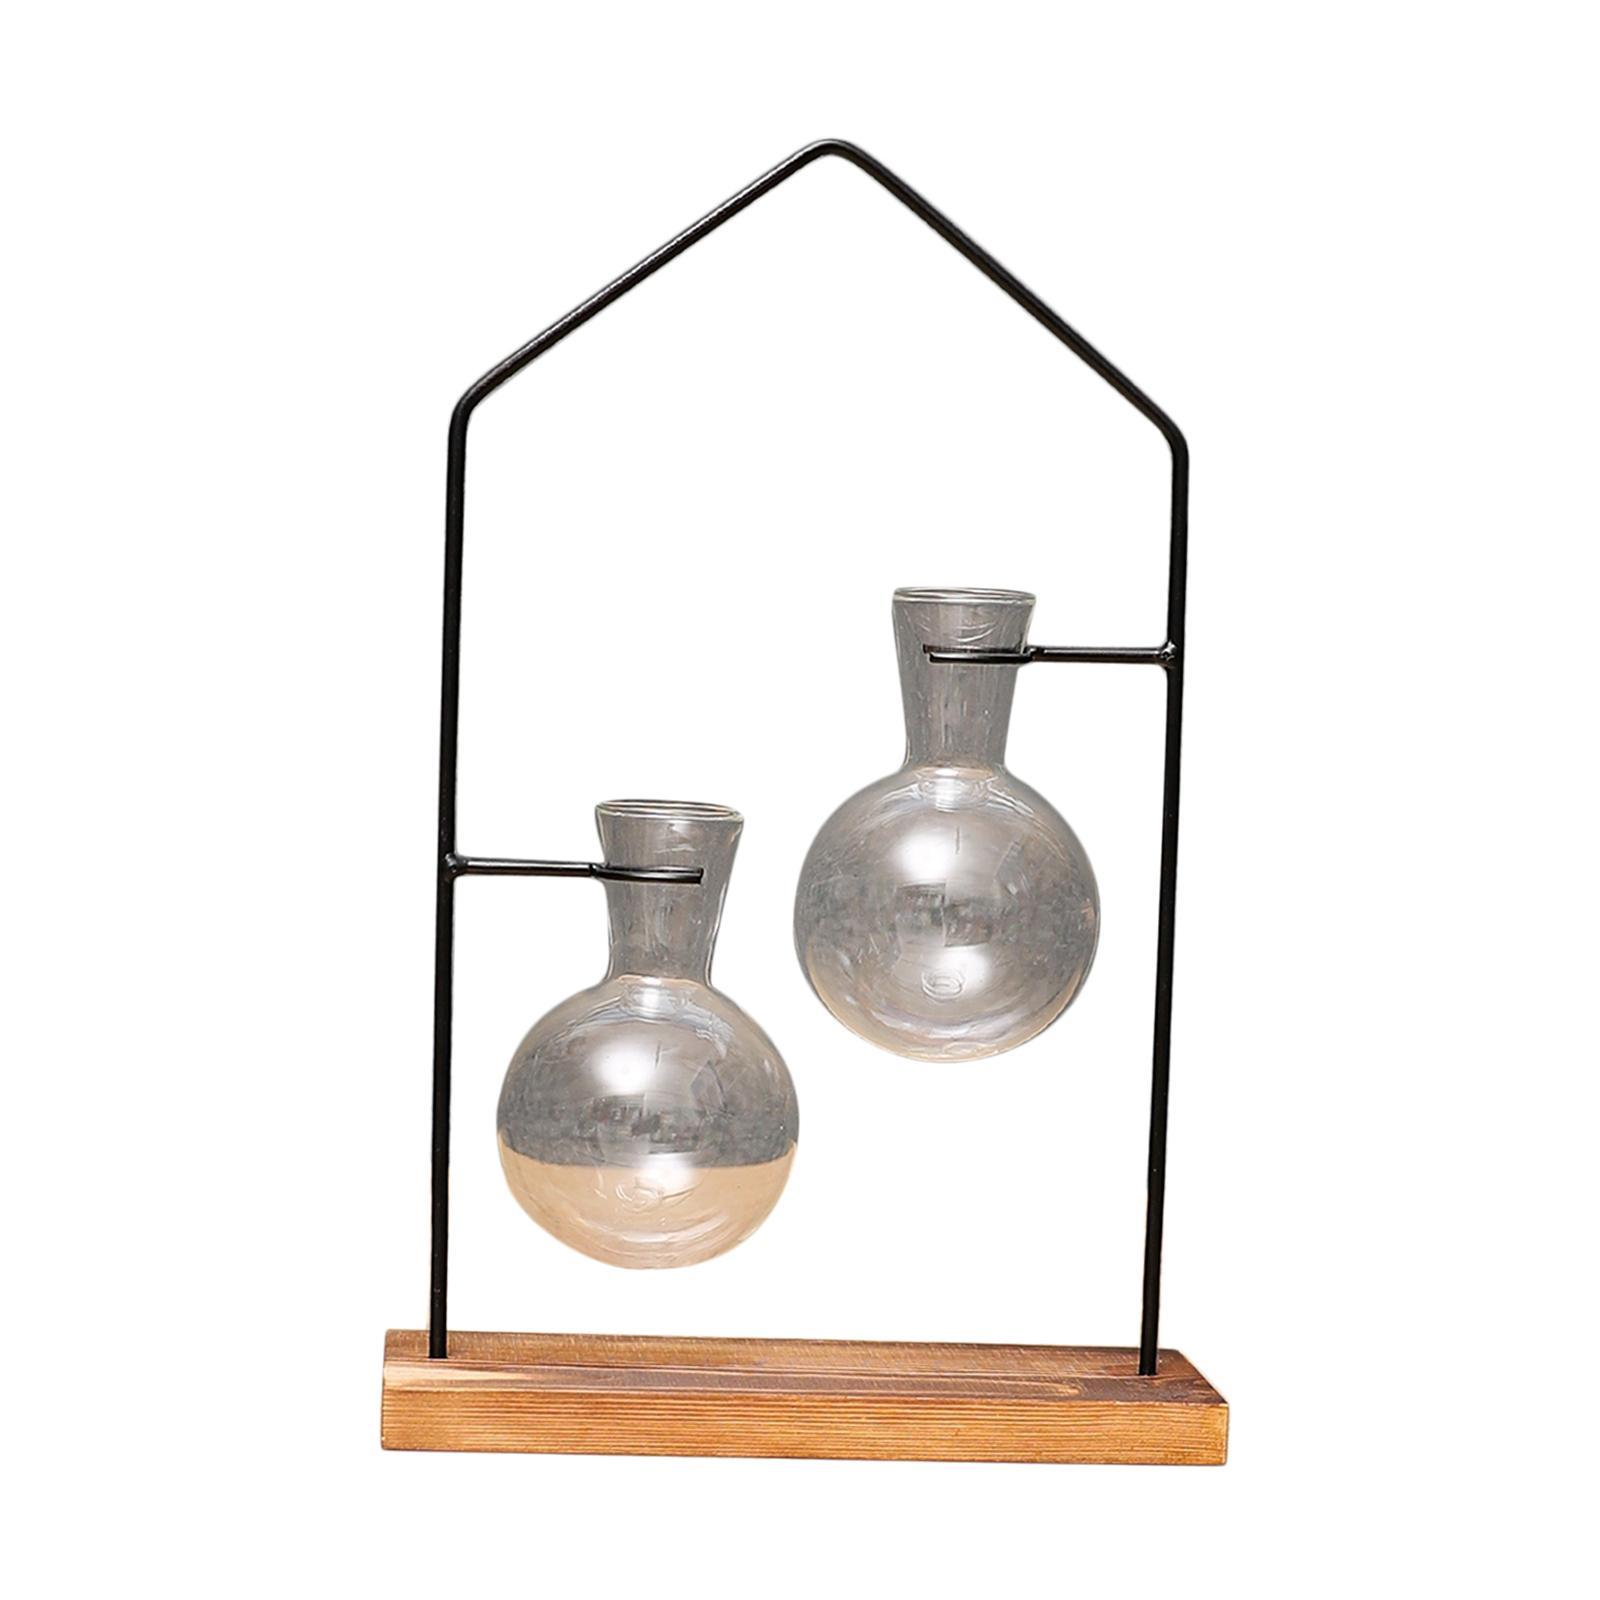 thumbnail 6 - Hydroponic Bonsai Plant Glass Vase Flower Pot Wood Stand Desk Decor